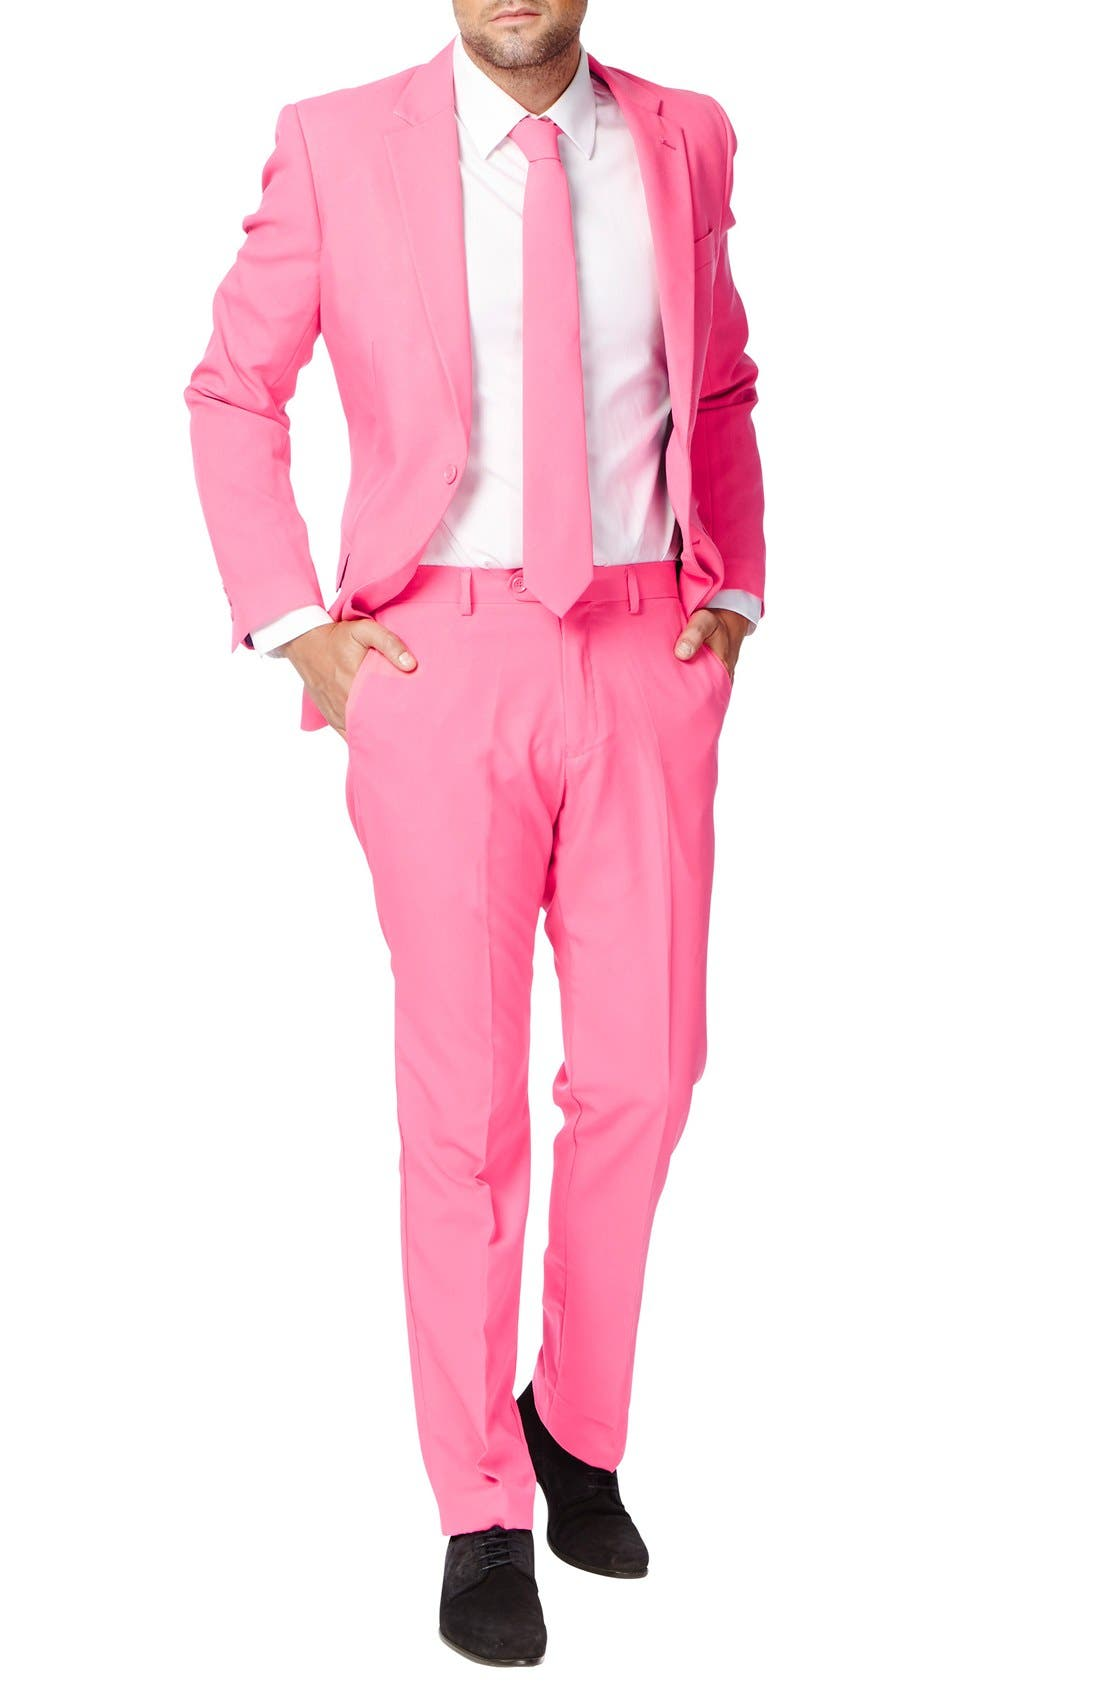 'Mr. Pink' Trim Fit Two-Piece Suit with Tie,                         Main,                         color, 650